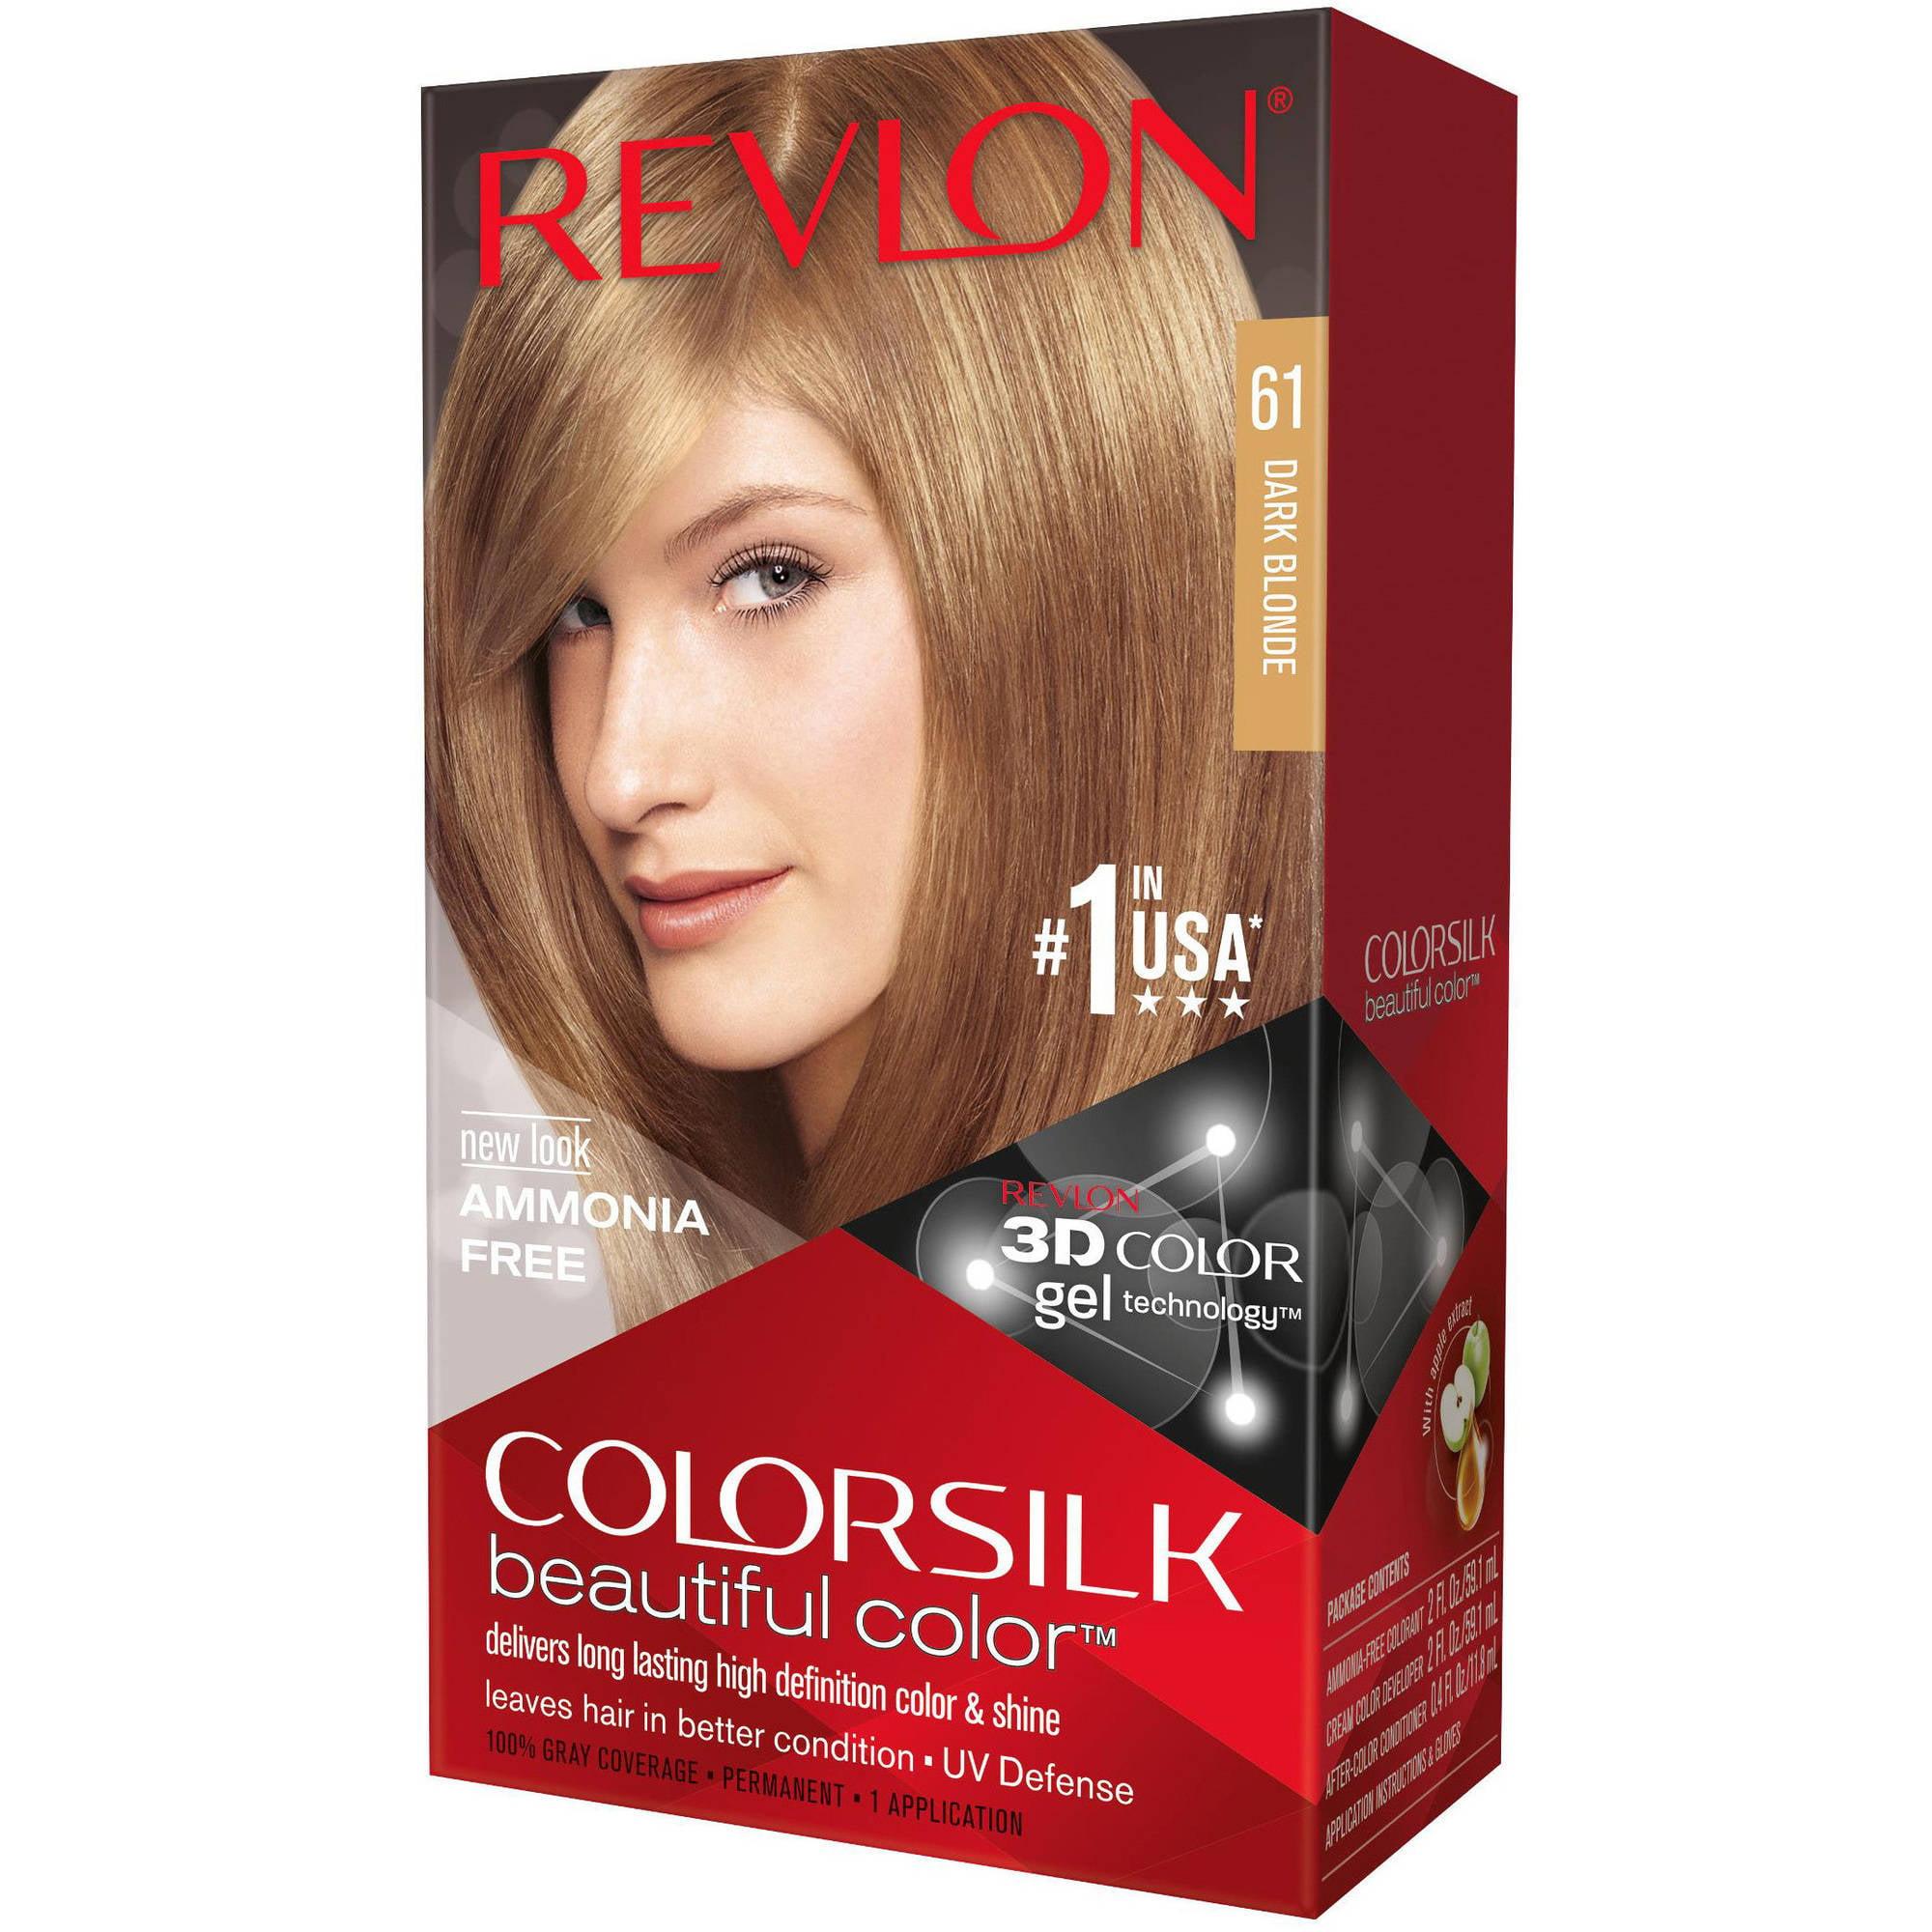 Revlon Colorsilk Beautiful Color Permanent Hair Color, 61 Dark Blonde